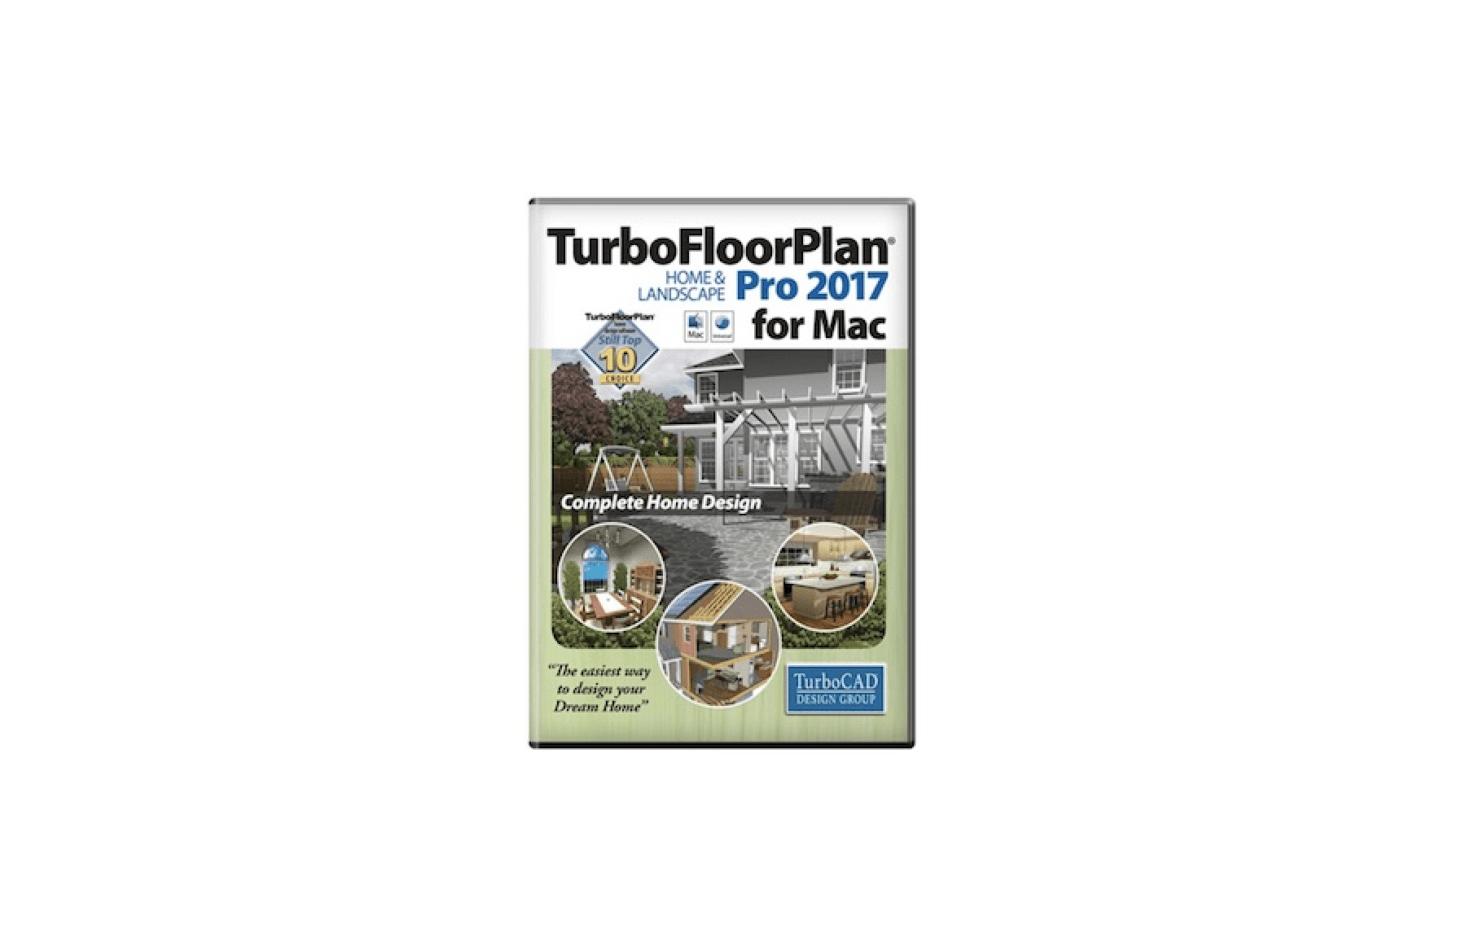 The Why Choosing Free Garden Designer For Mac